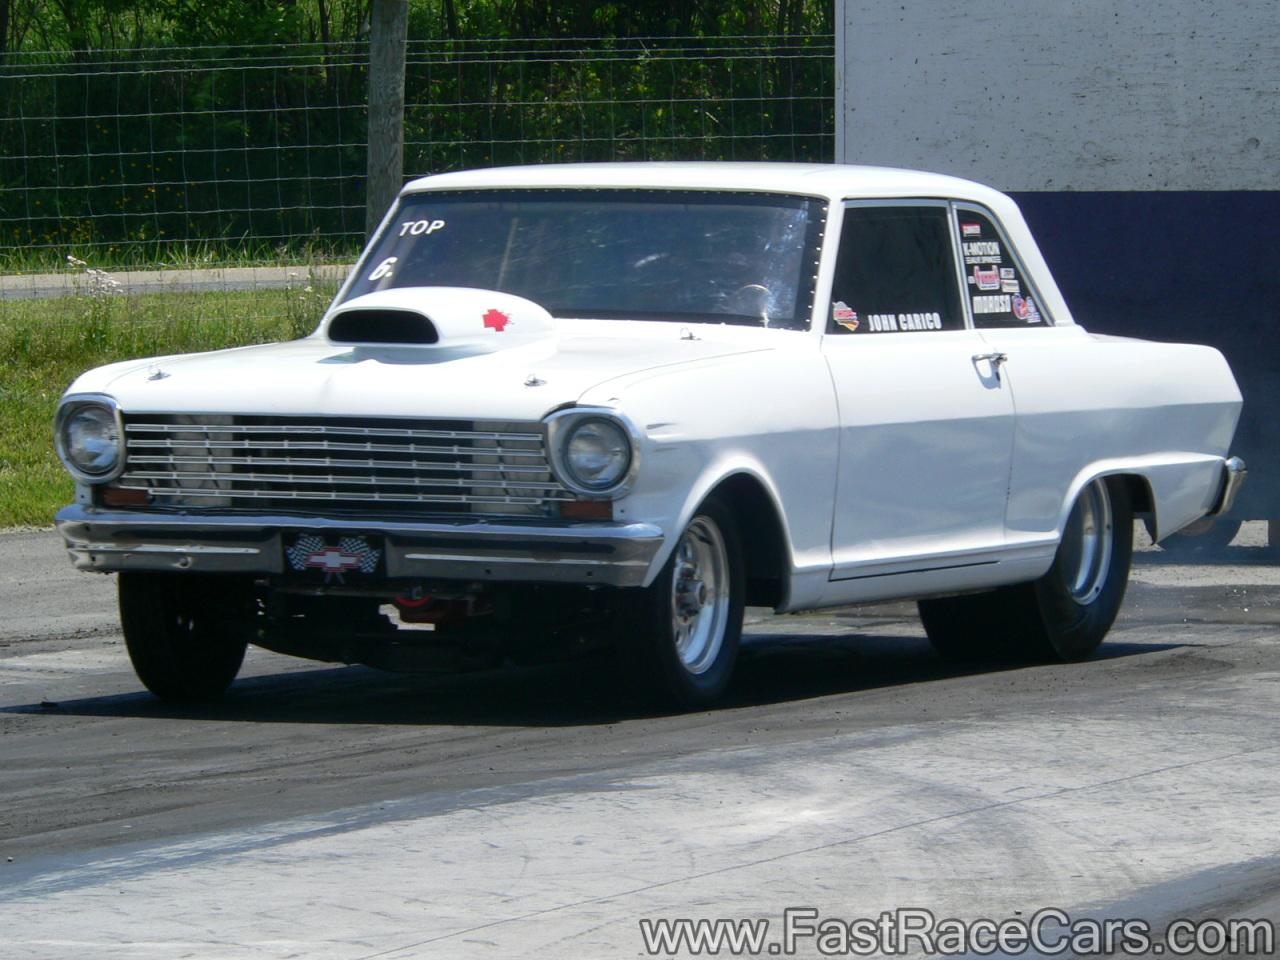 drag race cars novas picture of white nova drag car. Black Bedroom Furniture Sets. Home Design Ideas